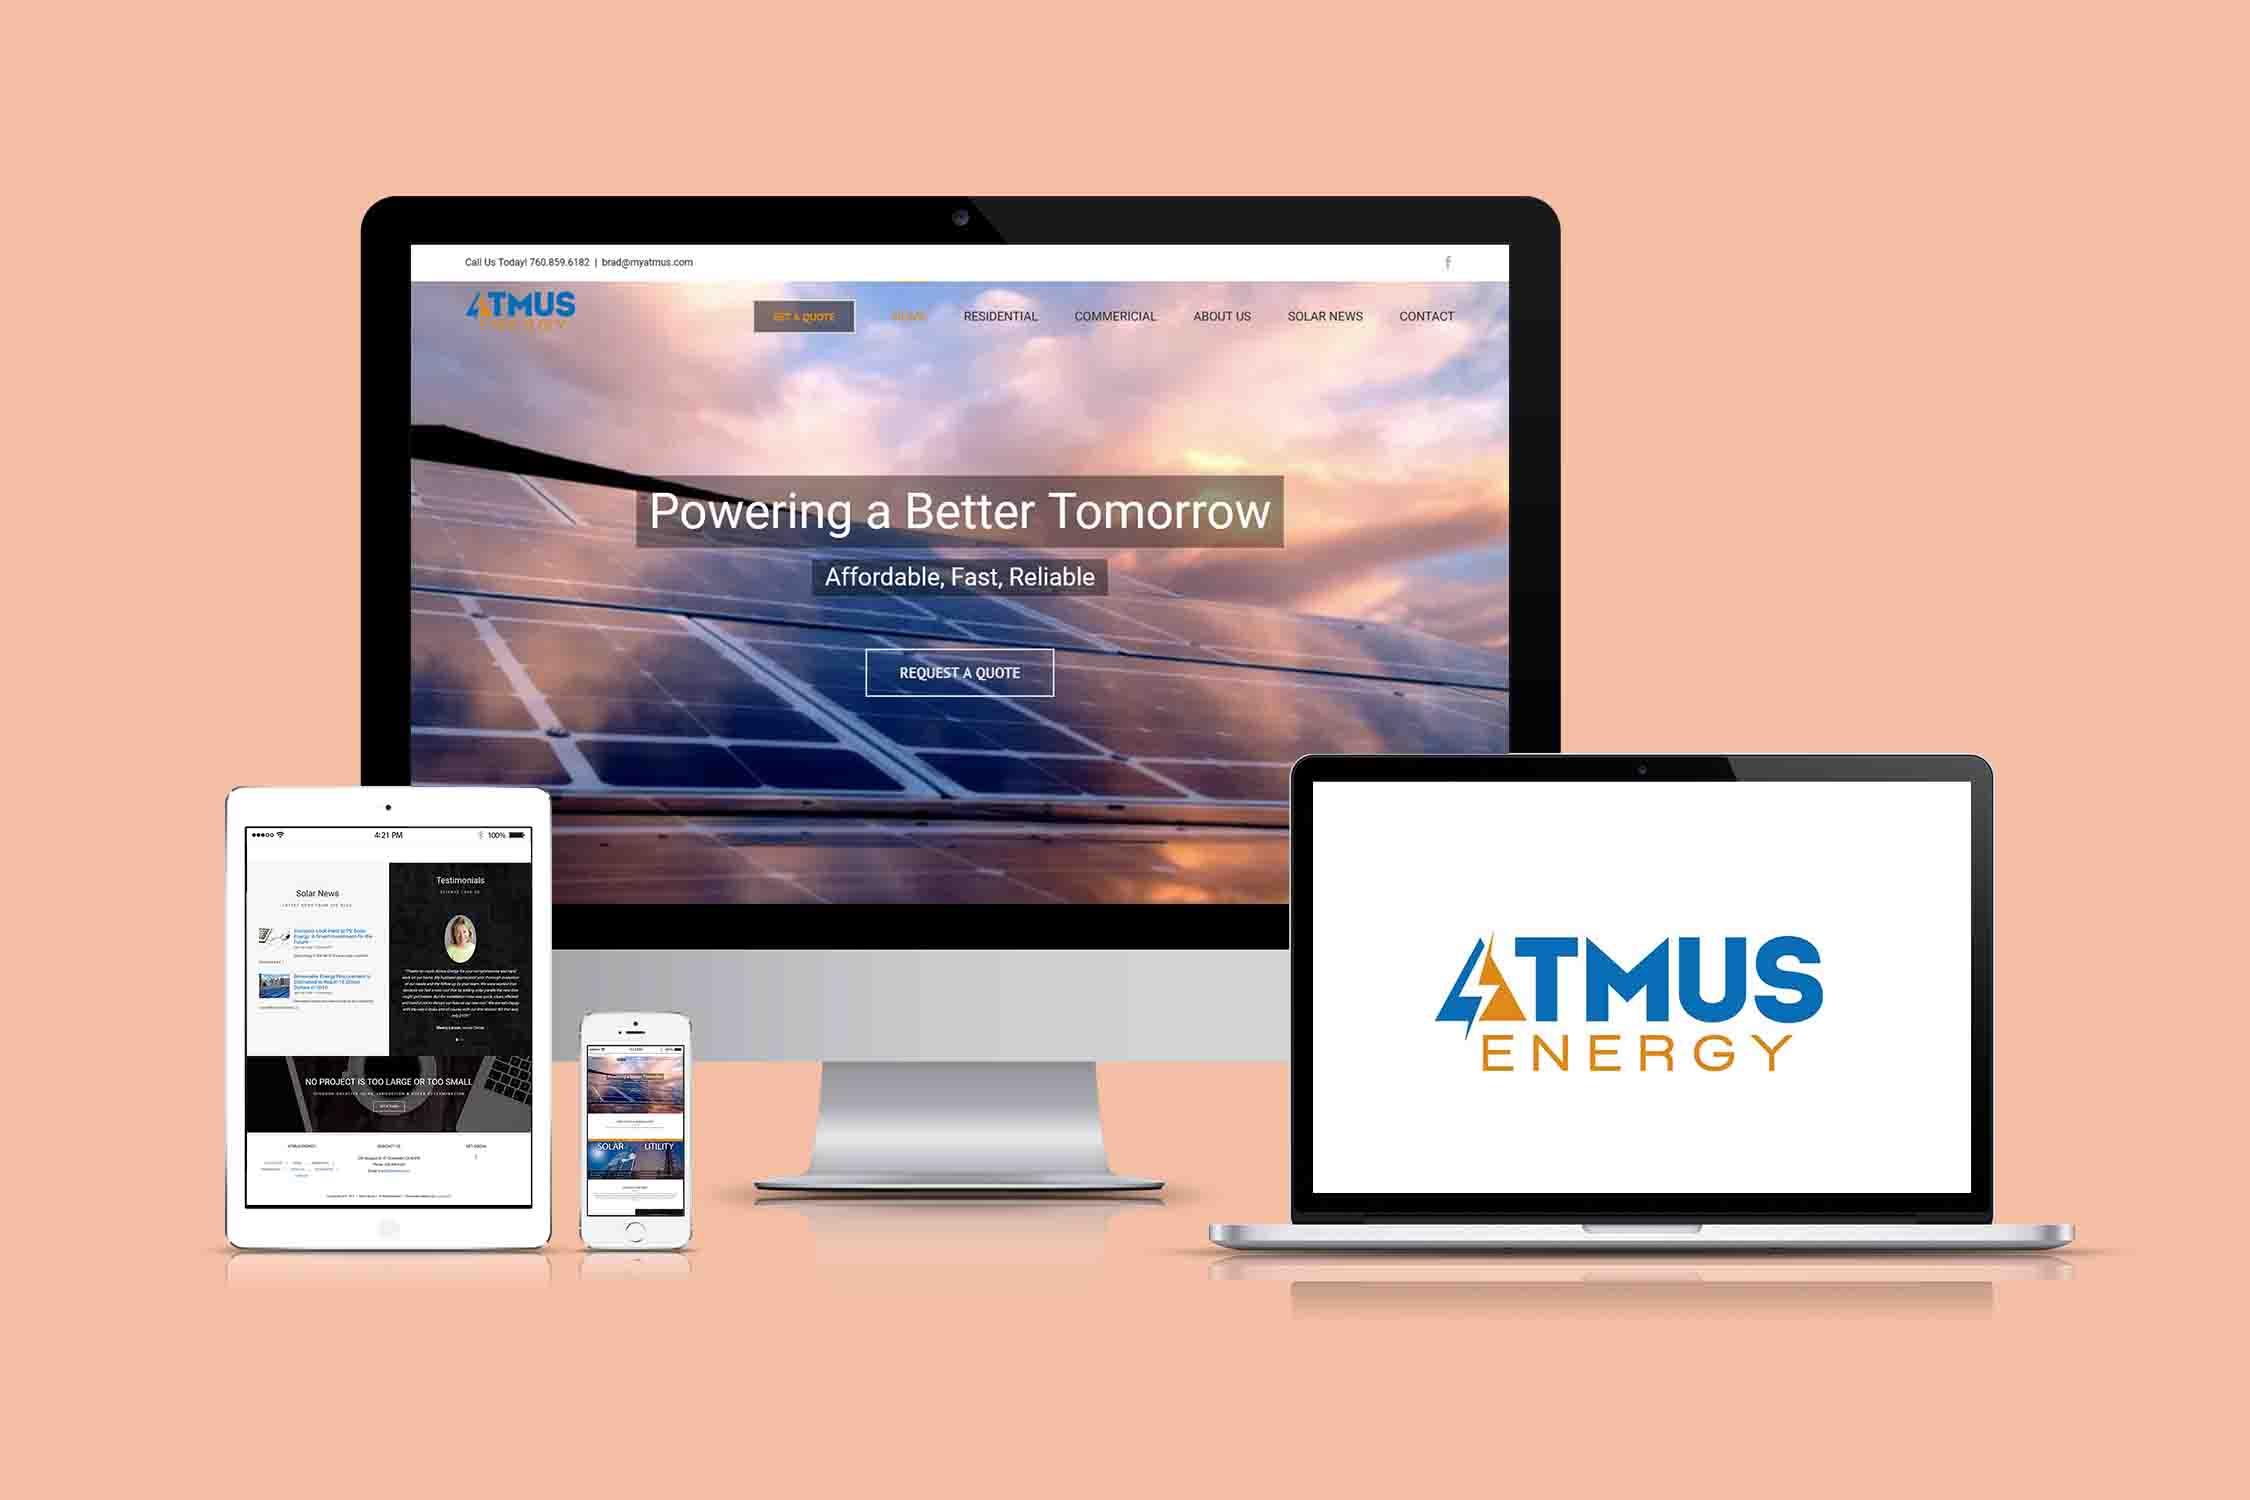 Atmus Energy